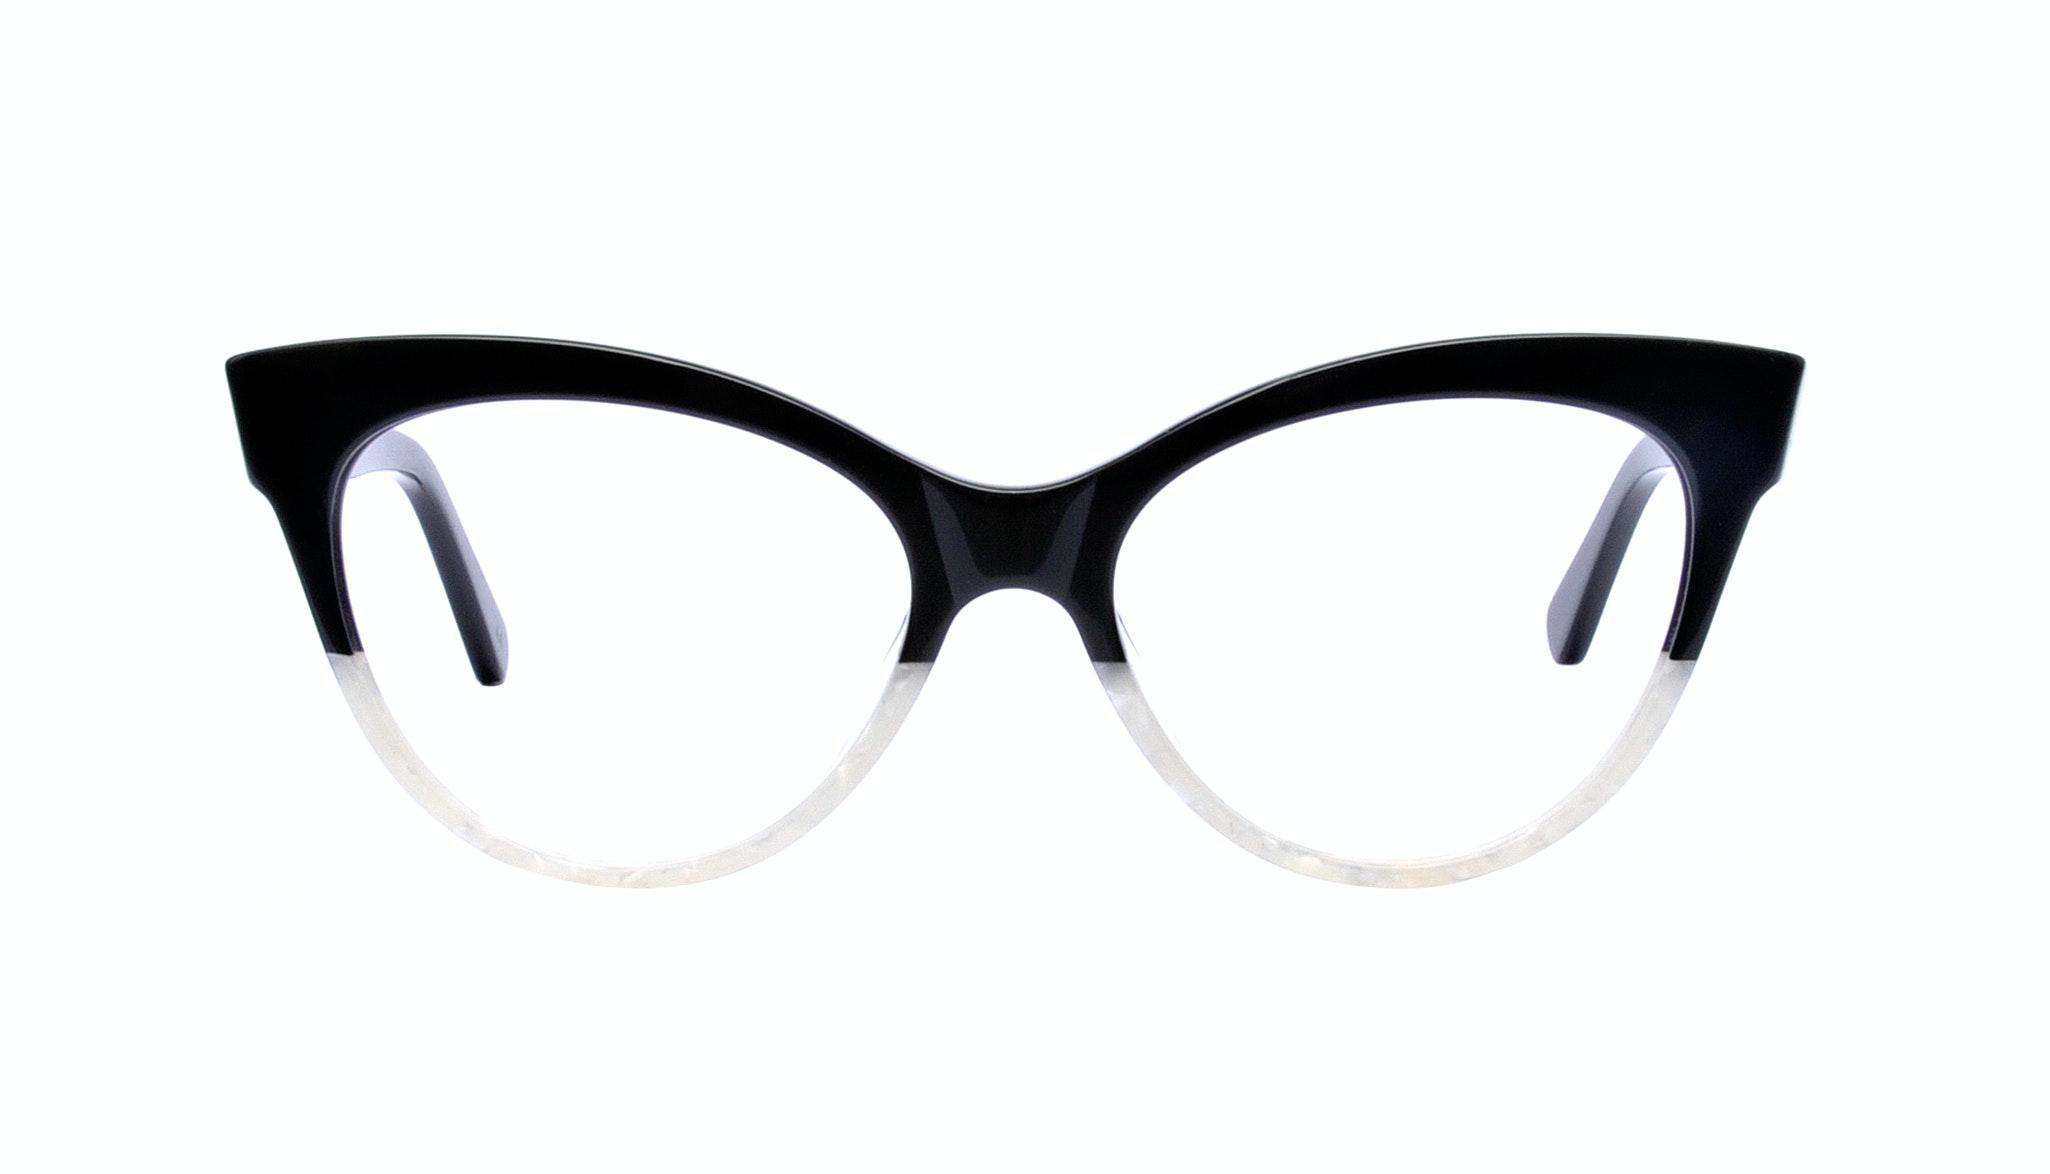 Affordable Fashion Glasses Cat Eye Eyeglasses Women SkunkBoy Panda Pearl Front